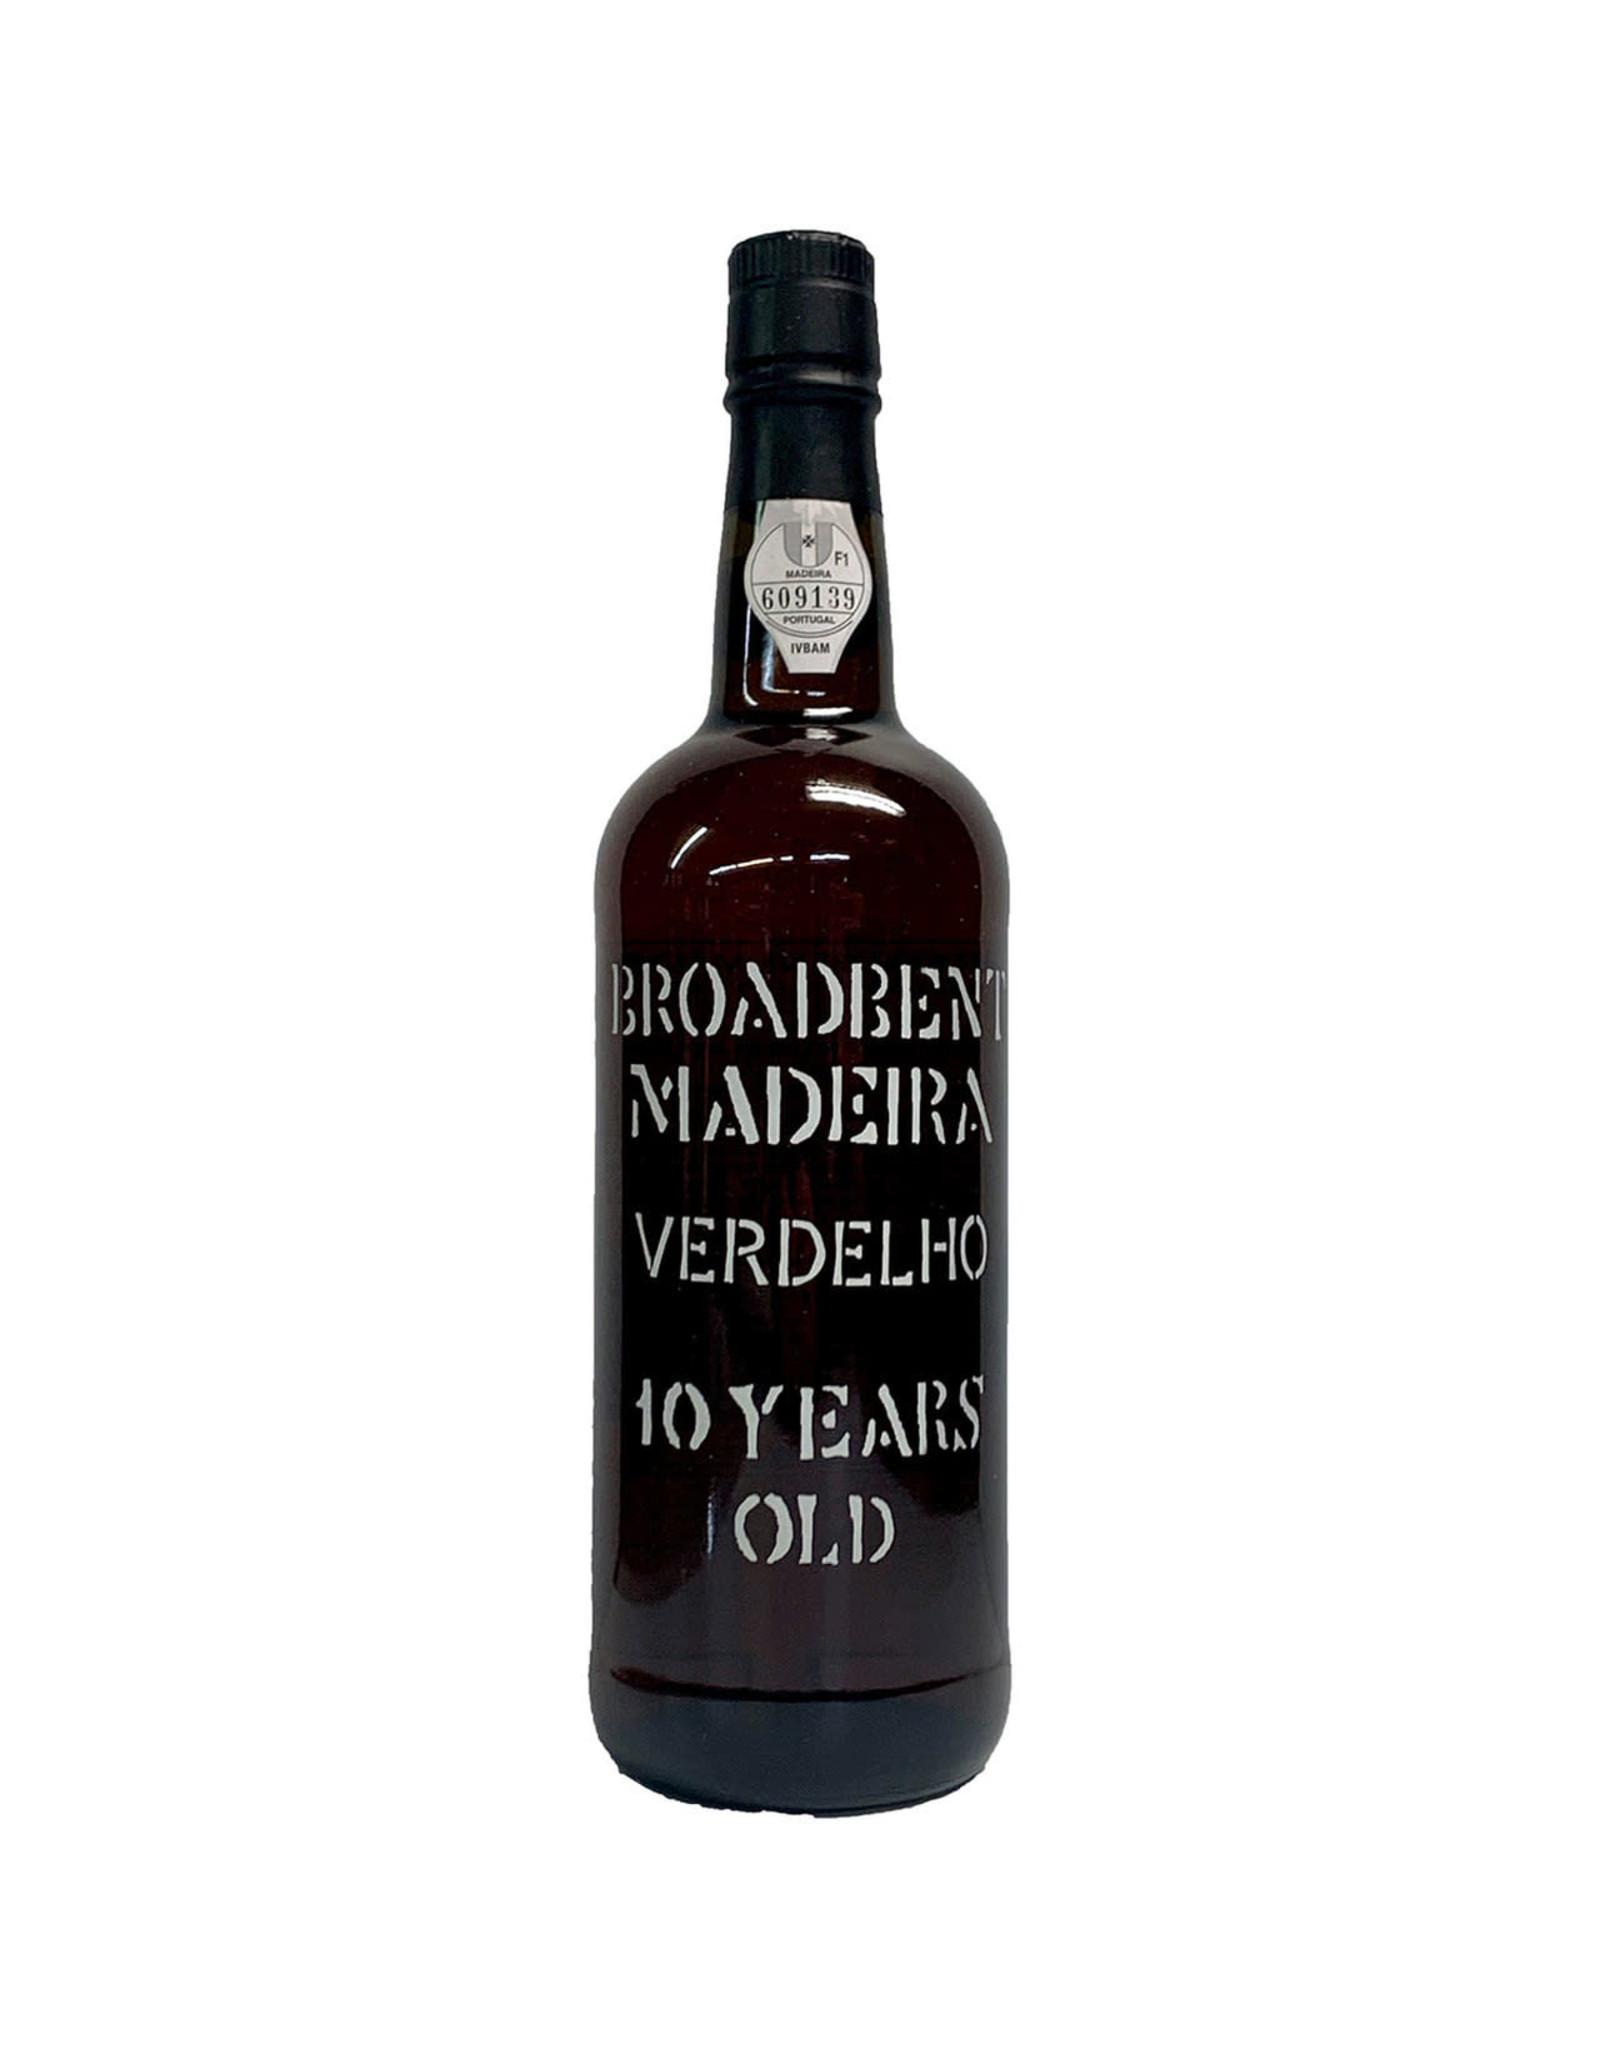 Broadbent Madeira Verdelho 10 year